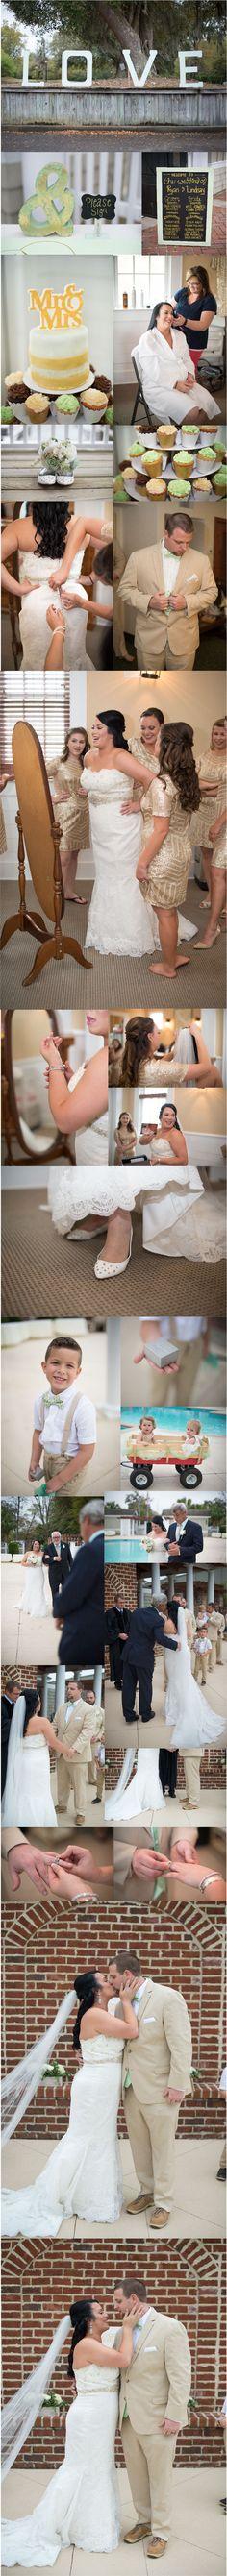 Ryan and Lindsay – March 26, 2016 – Reserve Harbor Yacht Club | Alicia Marie – Myrtle Beach Photographers – Wedding Photographers – Family Beach Portraits – Child Portraits – Infants – 843-685-3346